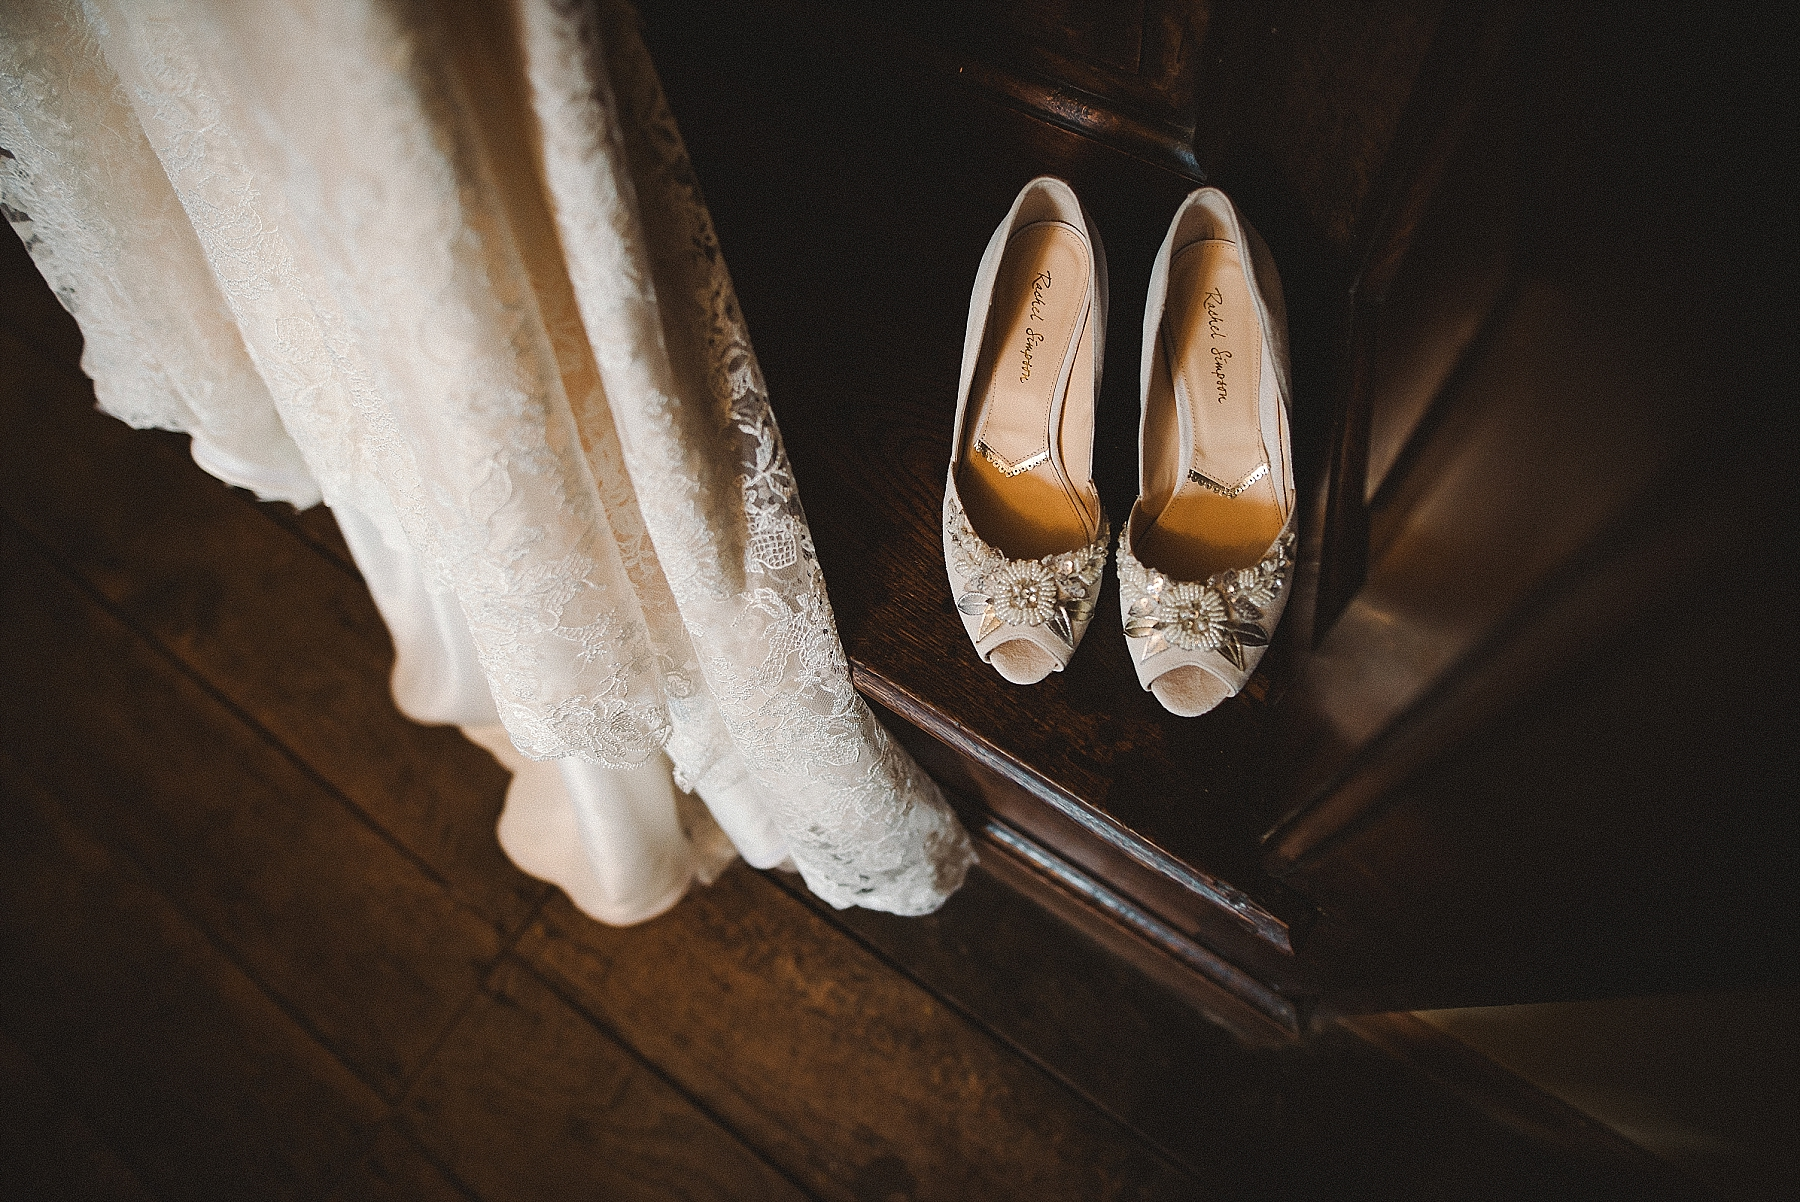 chris_keely_downton_lodge_wedding_0021.jpg